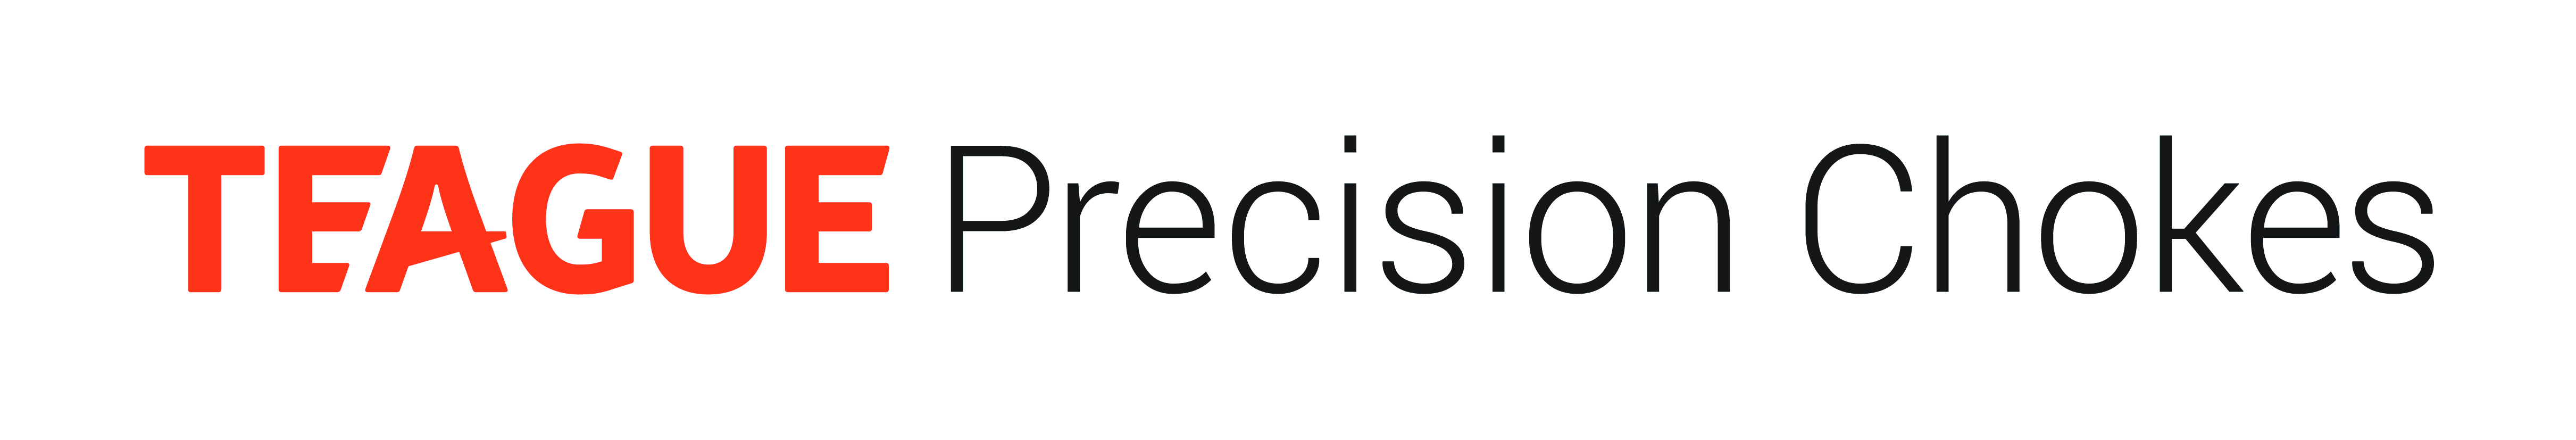 Teague_Precision_Chokes_logo